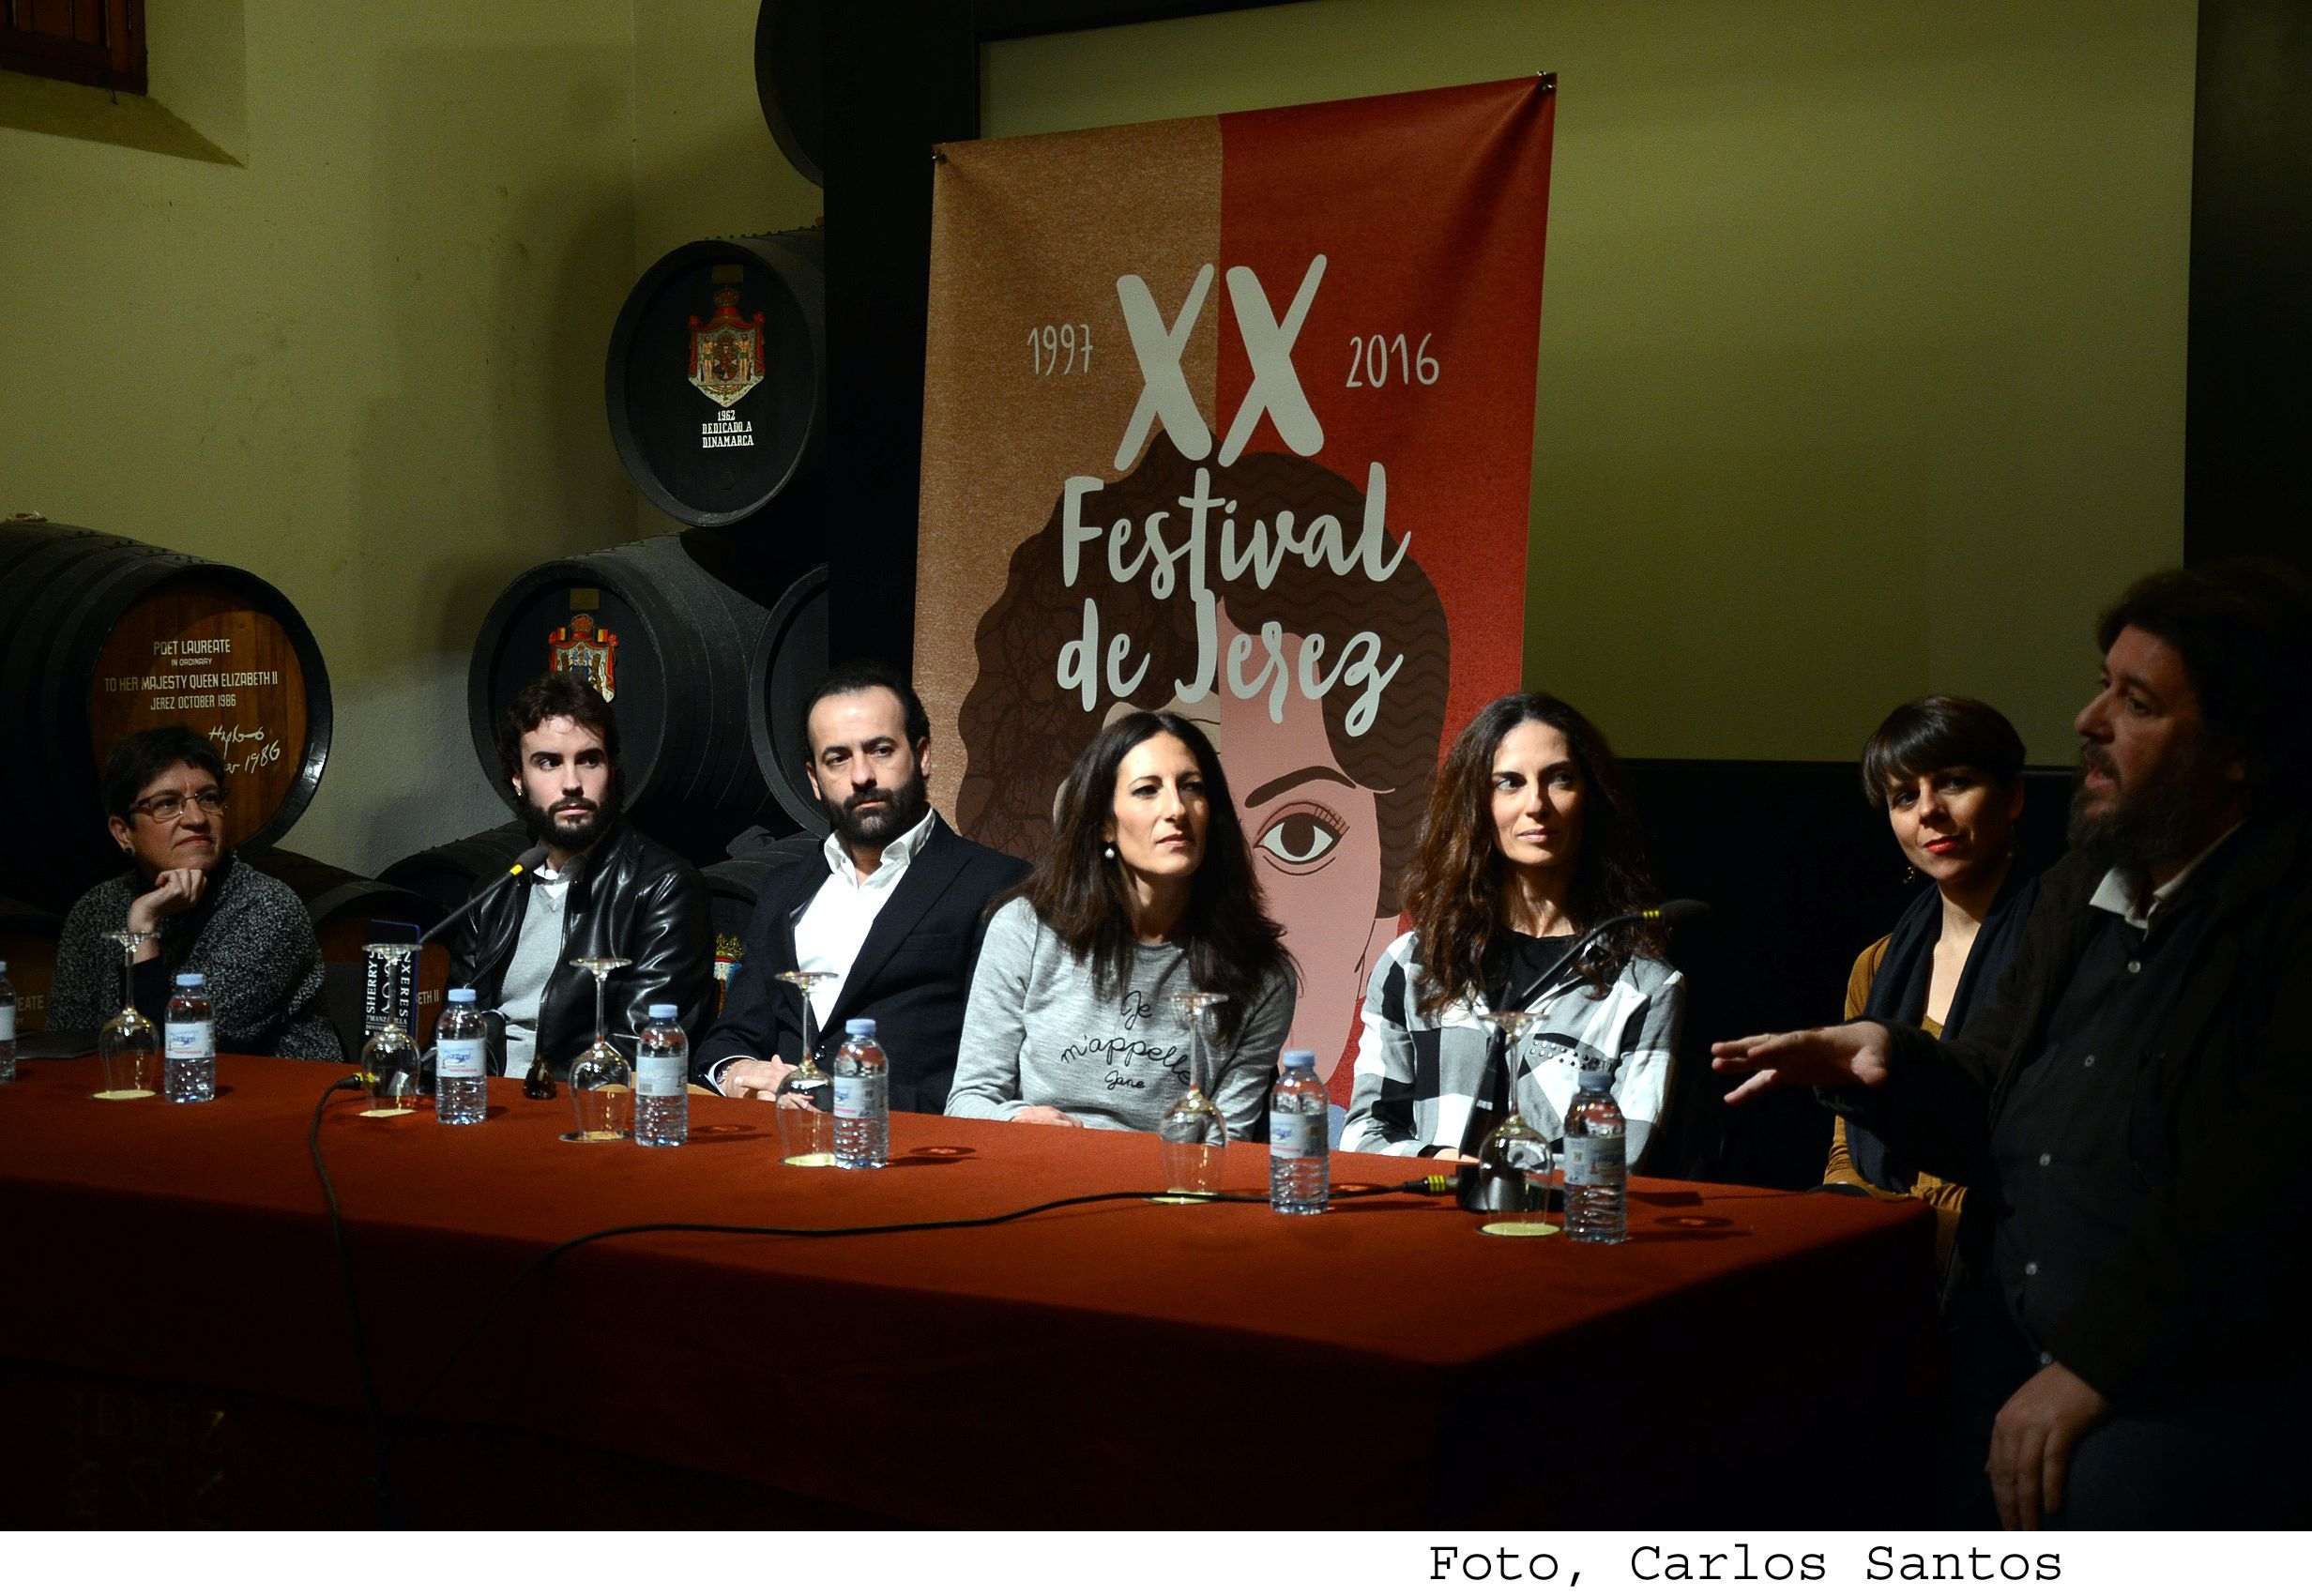 Rueda_Festival de Jerez